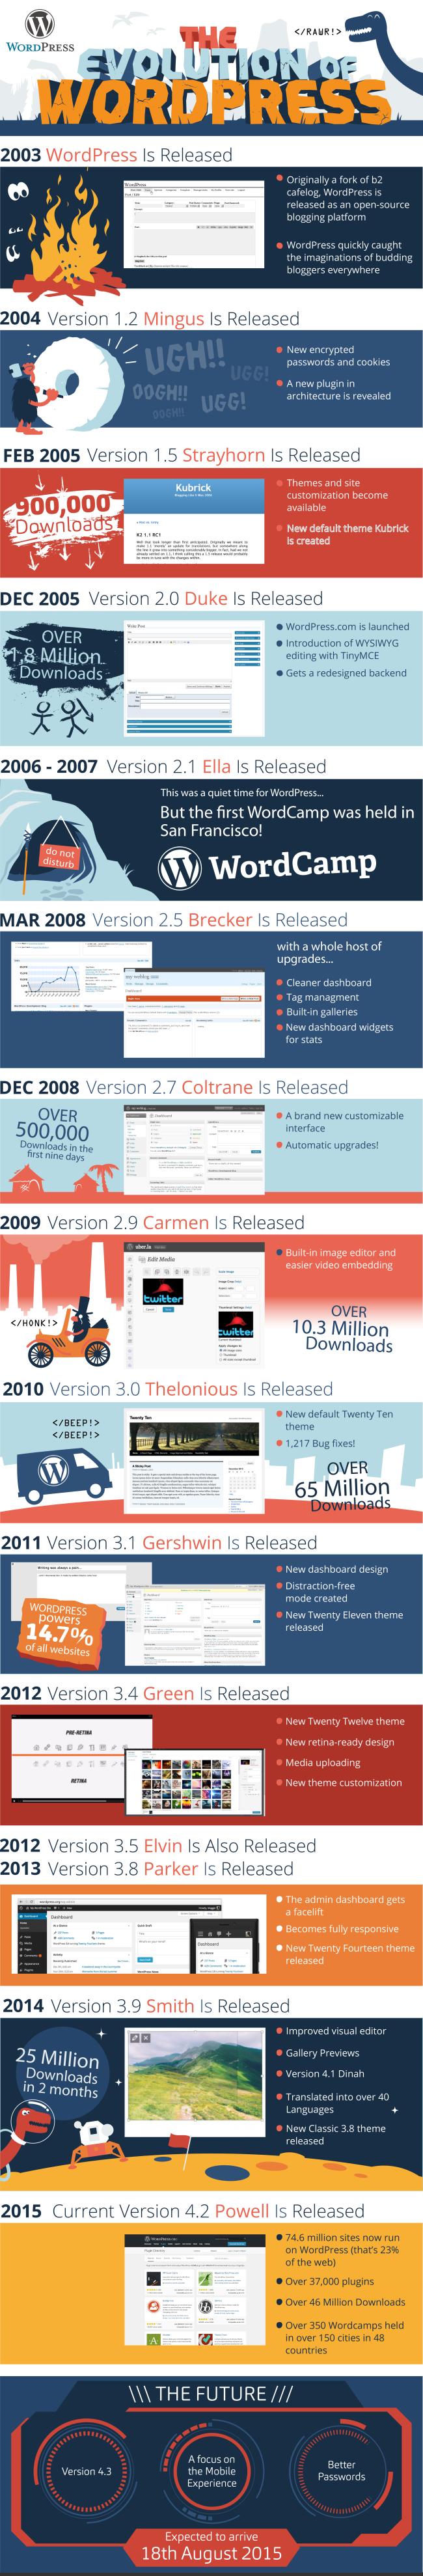 The Evolution of WordPress